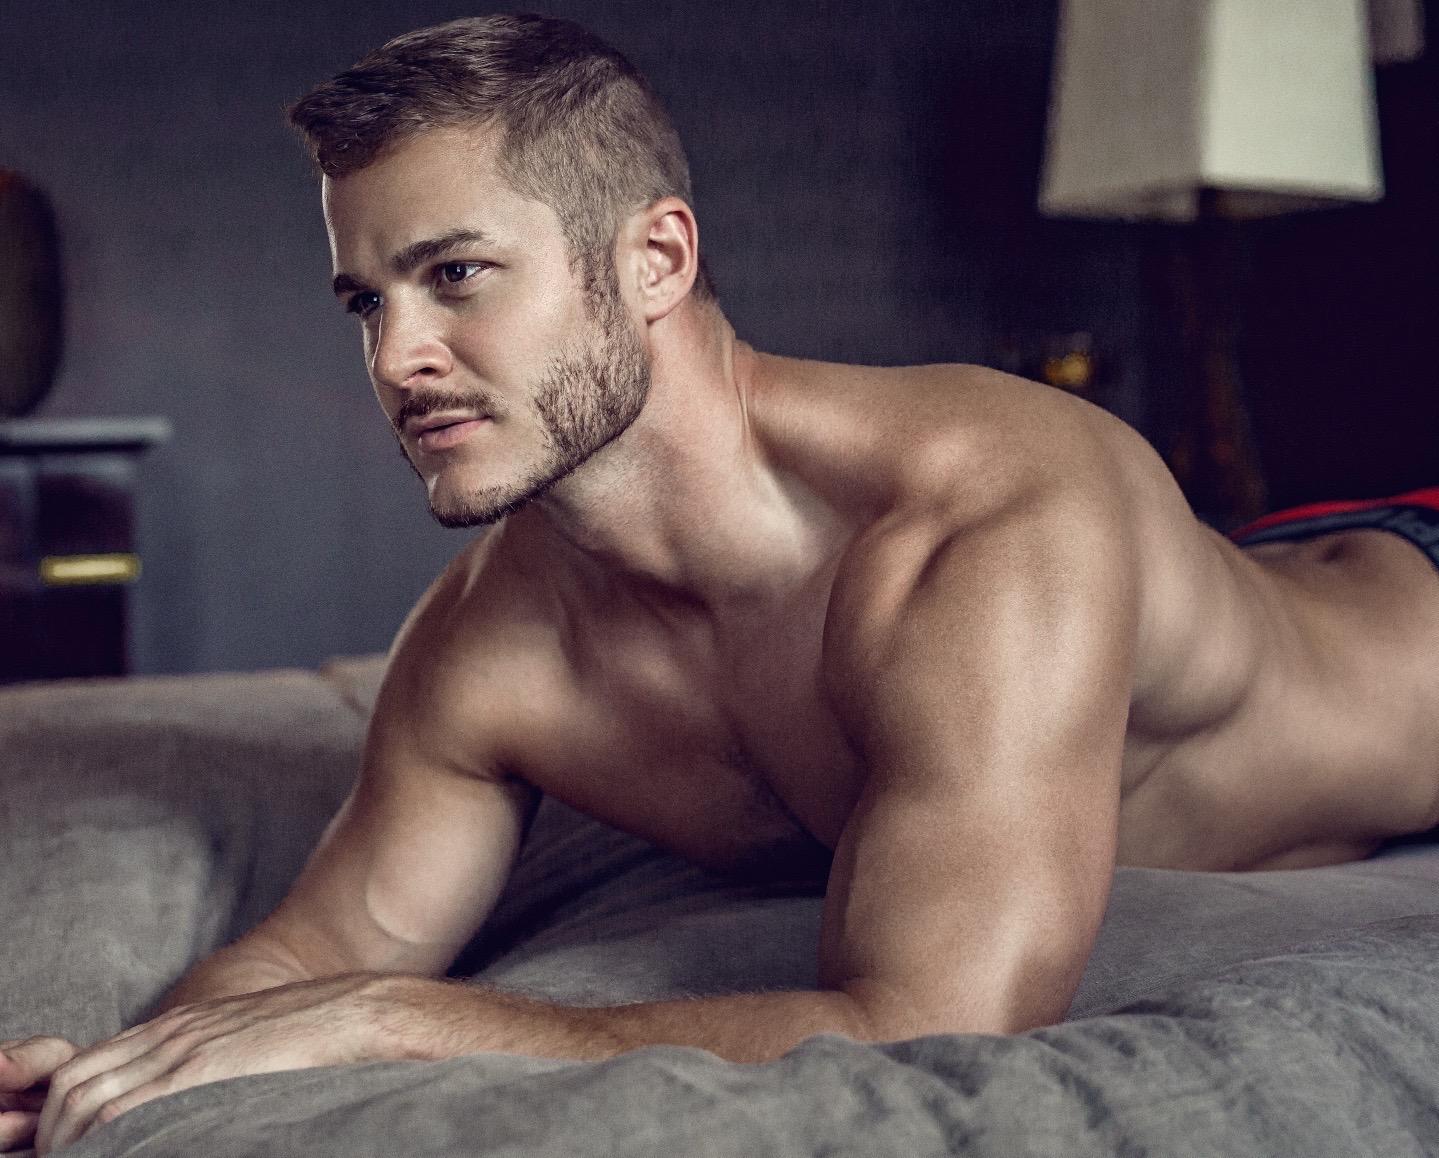 paul simon gay